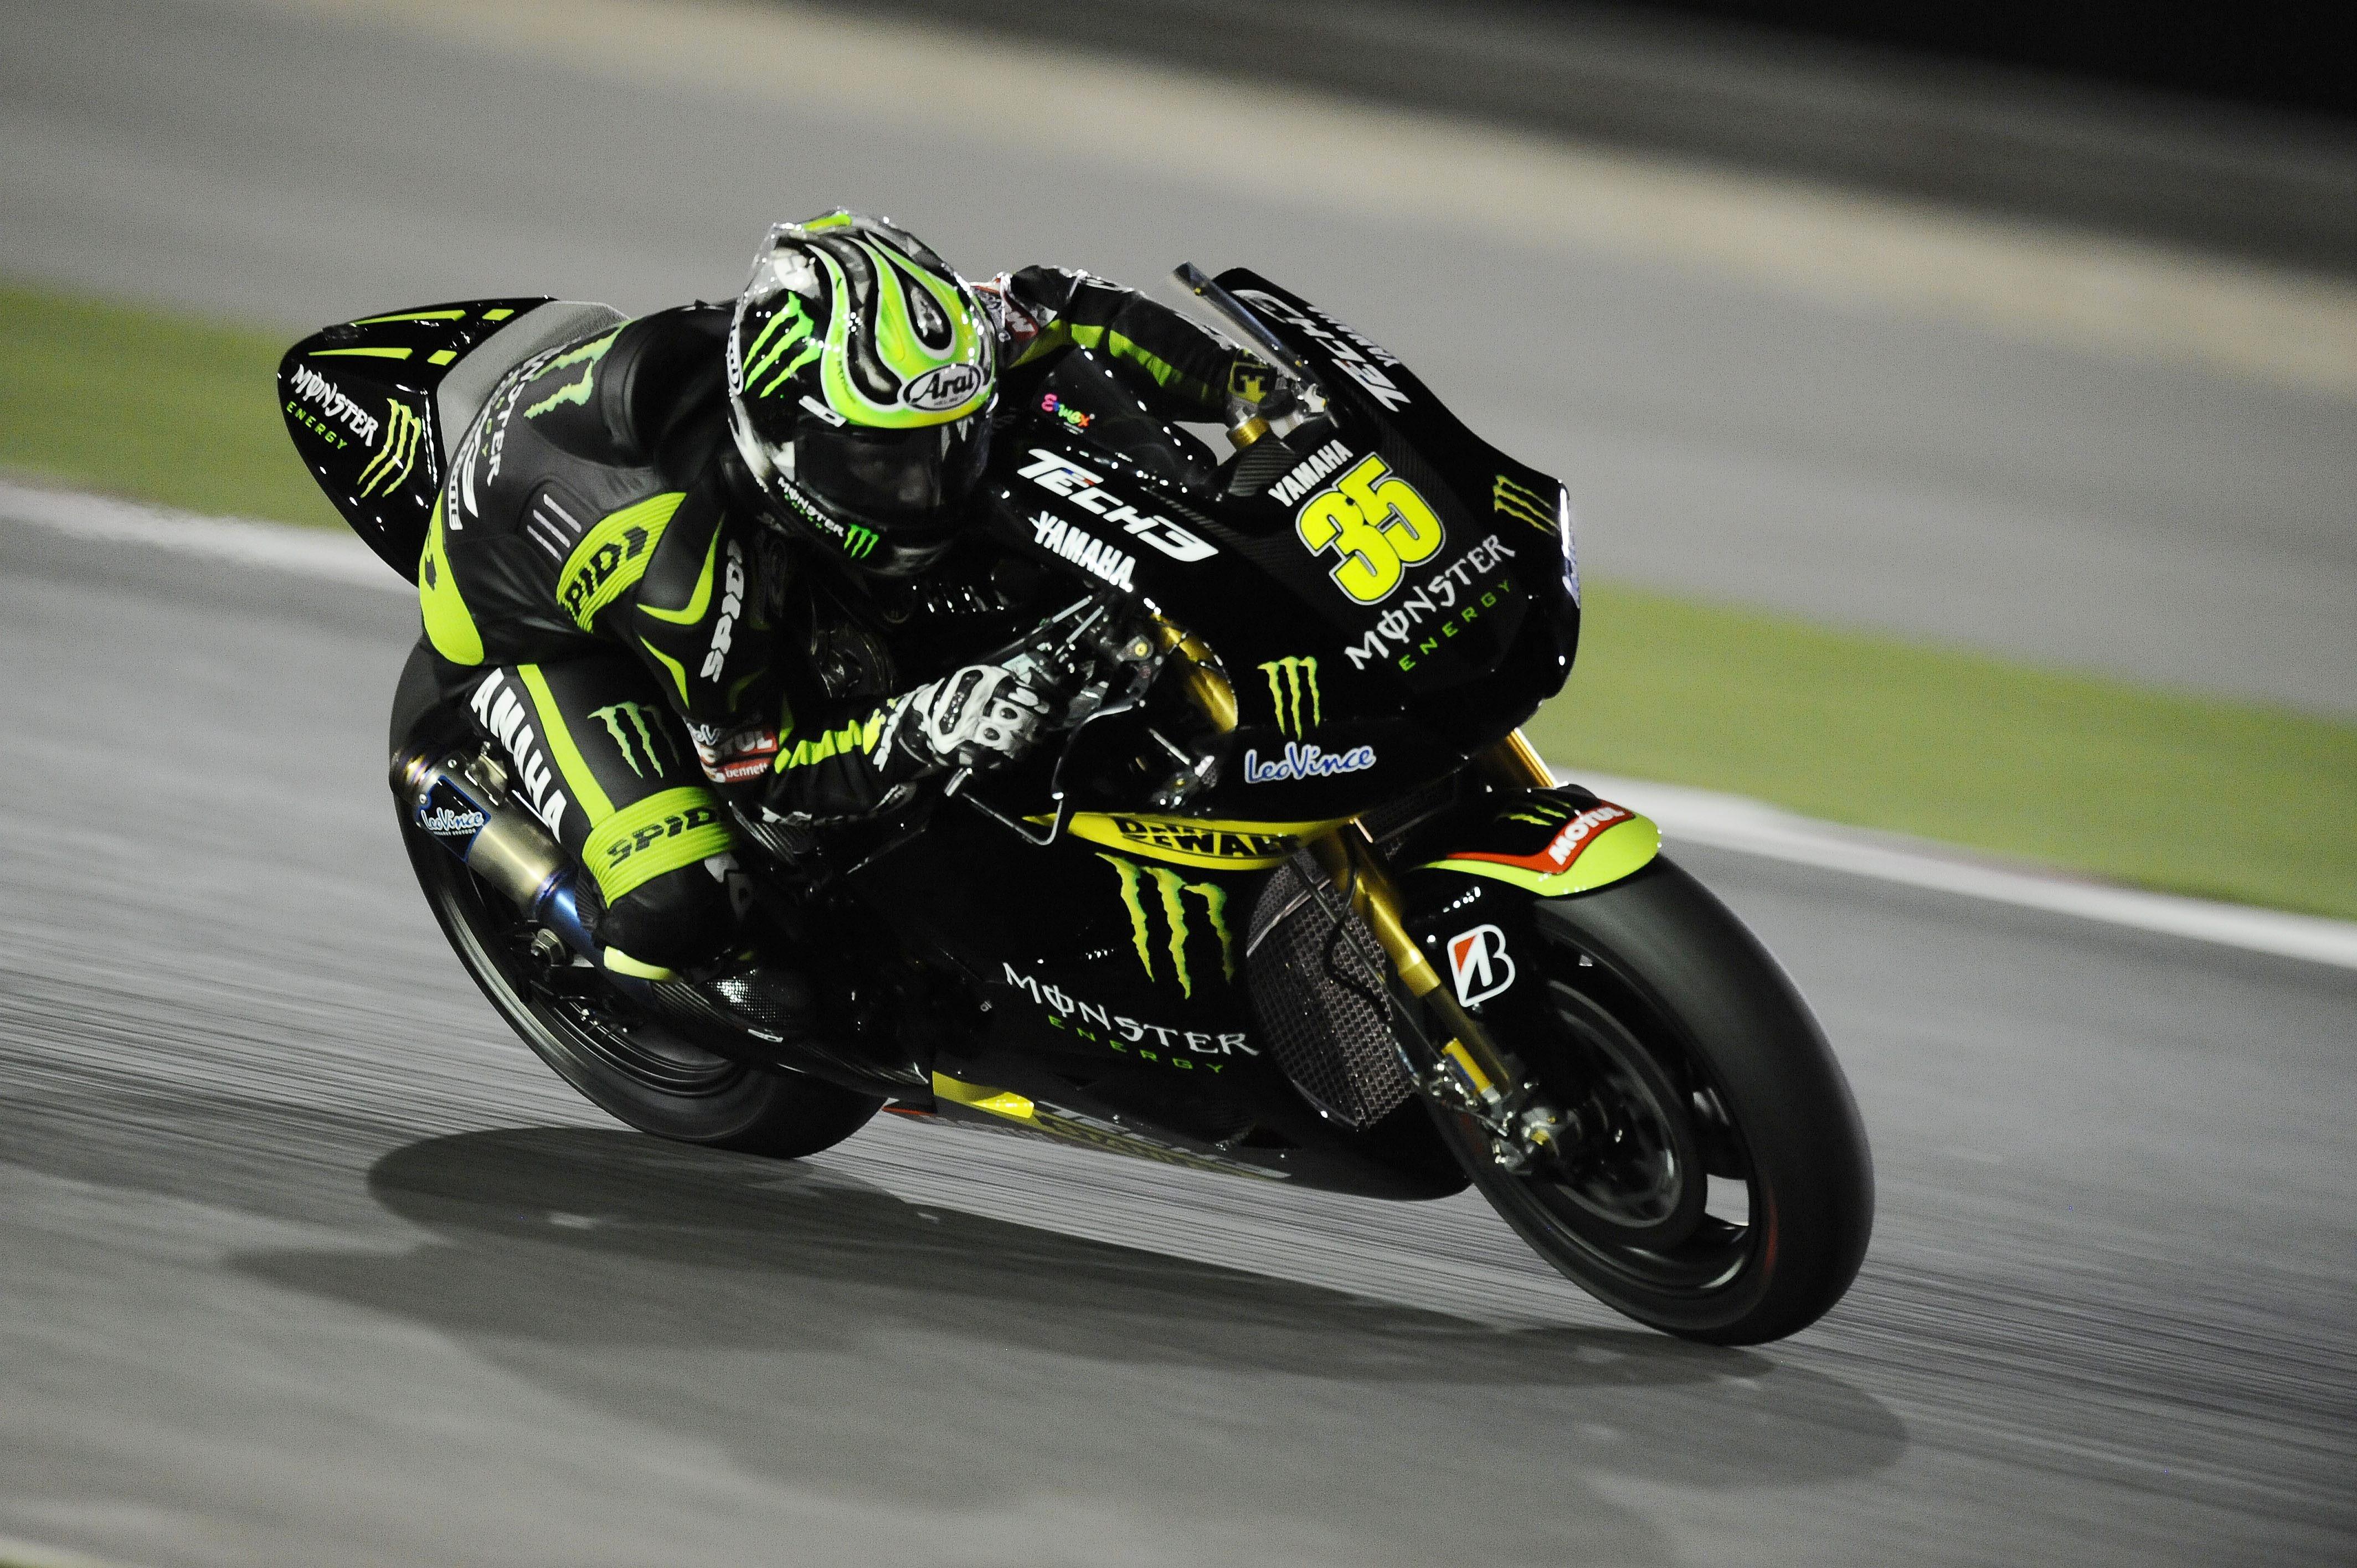 Cal Crutchlow MotoGP 2014 HD Wallpapers   New HD Wallpapers 4256x2832